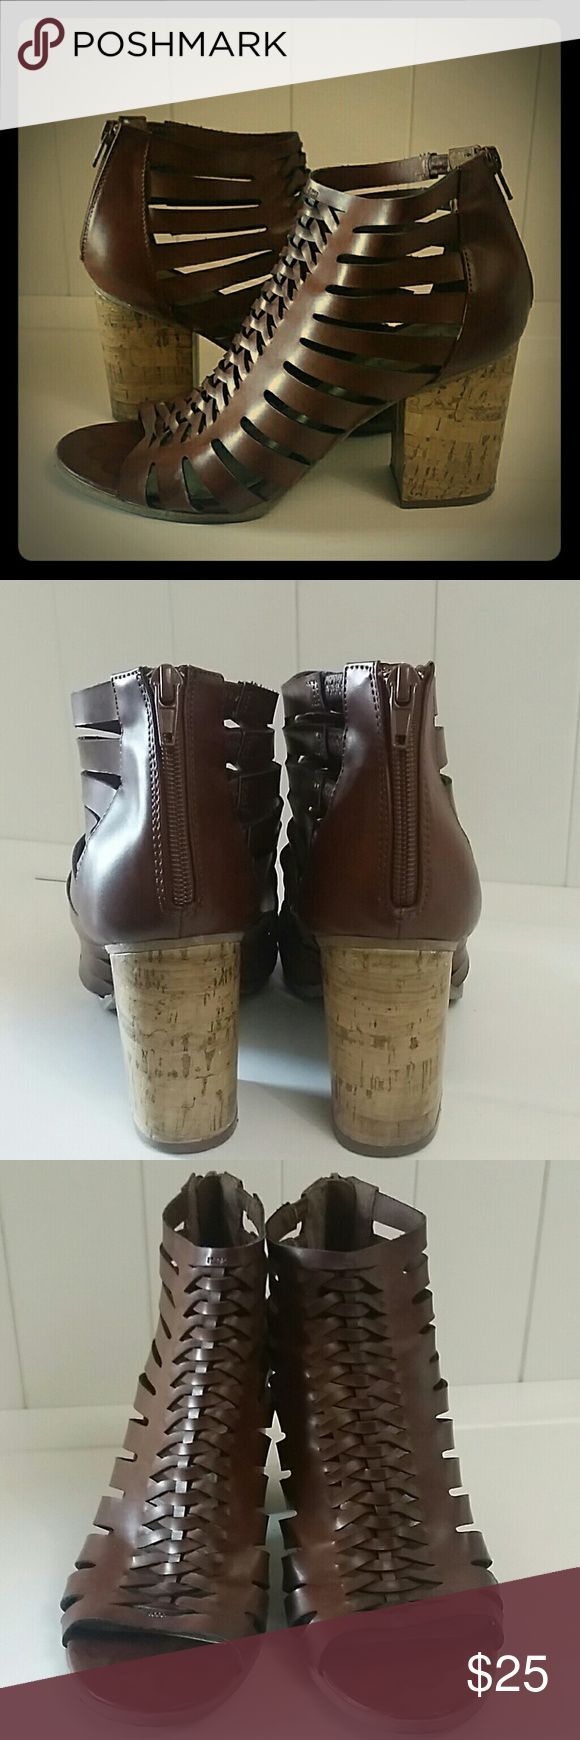 Strappy Gladiator Sandals heels booties indigo rd. Gladiator heels / sandals.  Size 9m indigo rd Shoes Sandals